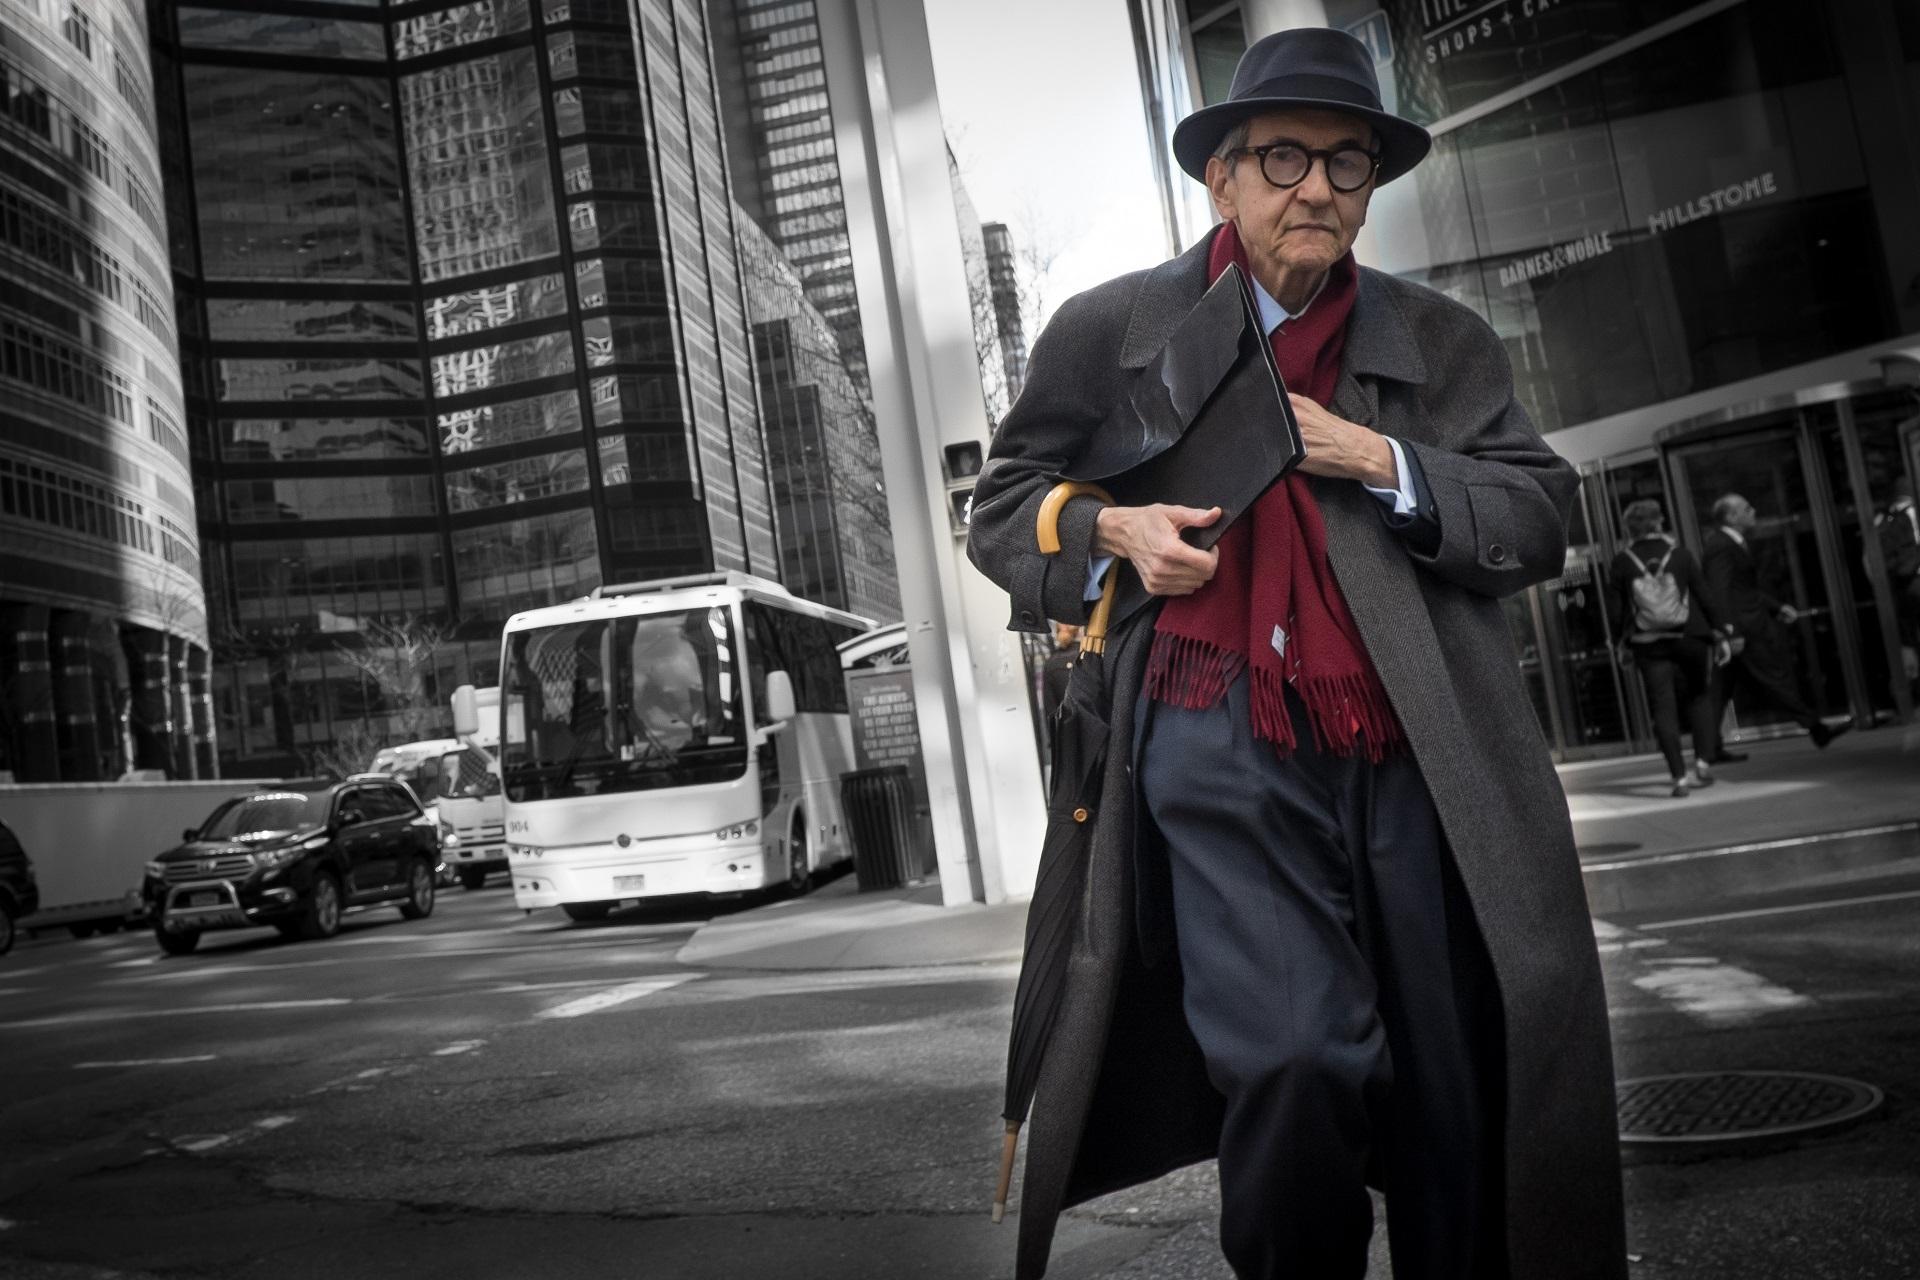 New York City Streets shoots